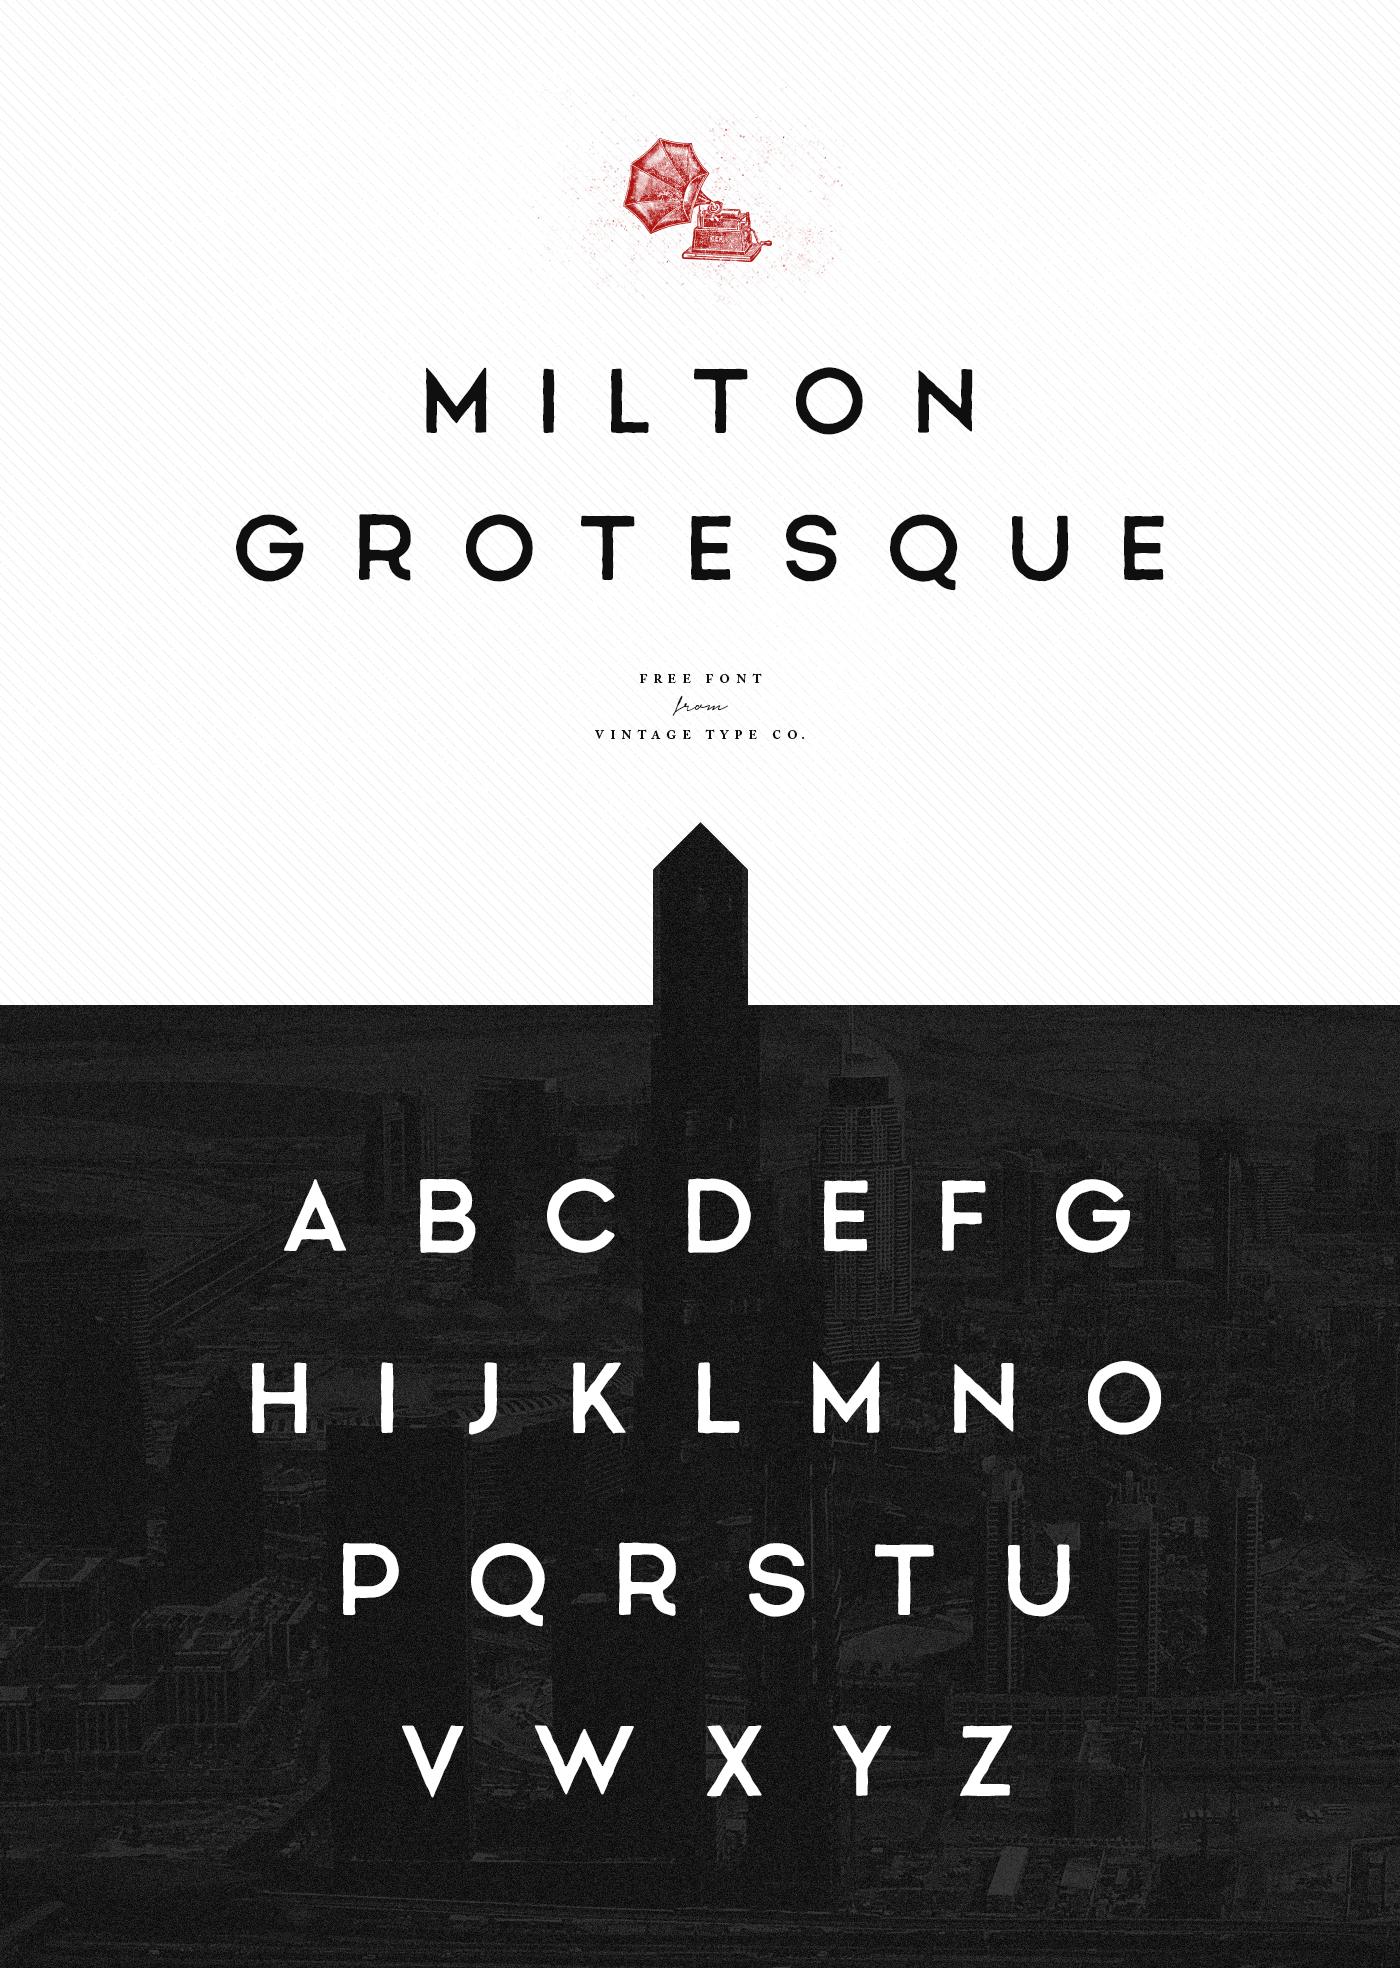 Milton Grotesque FREE Font 2017 on Behance